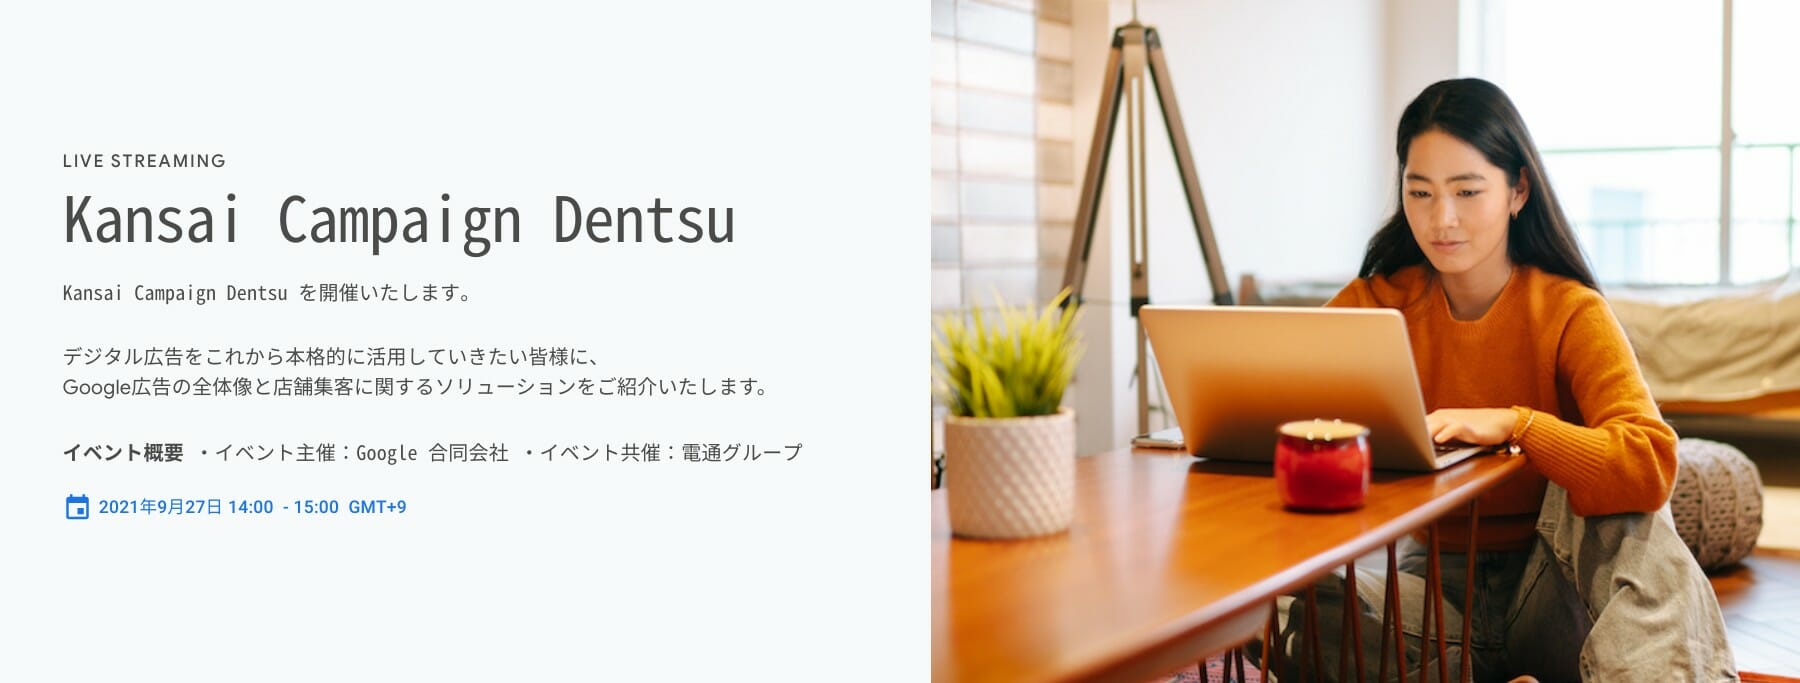 [Google 広告] Kansai Campaign Dentsu